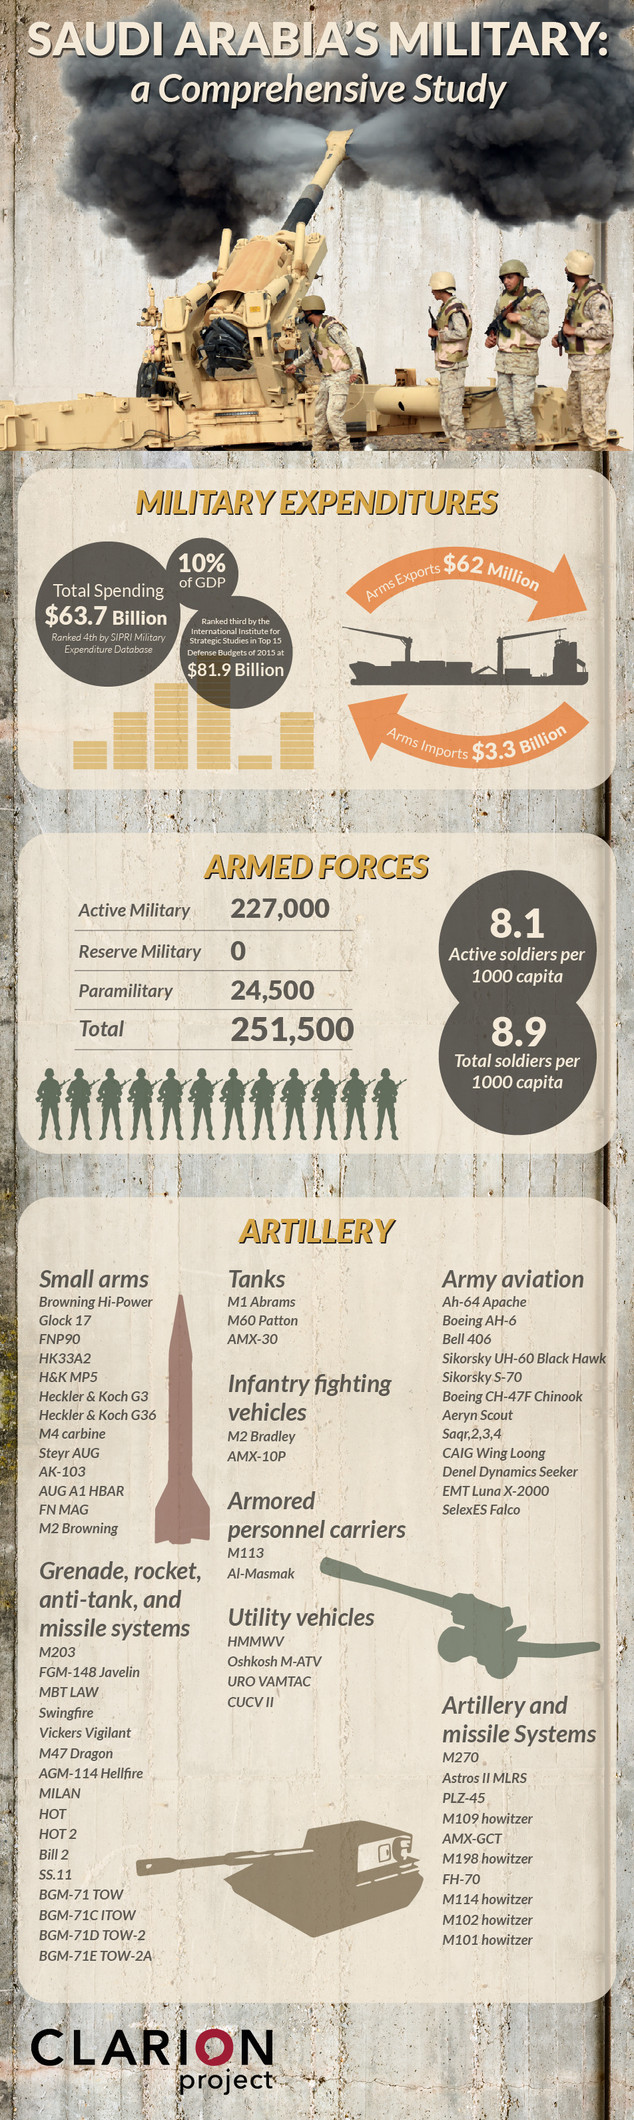 Saudi Military - Clarion